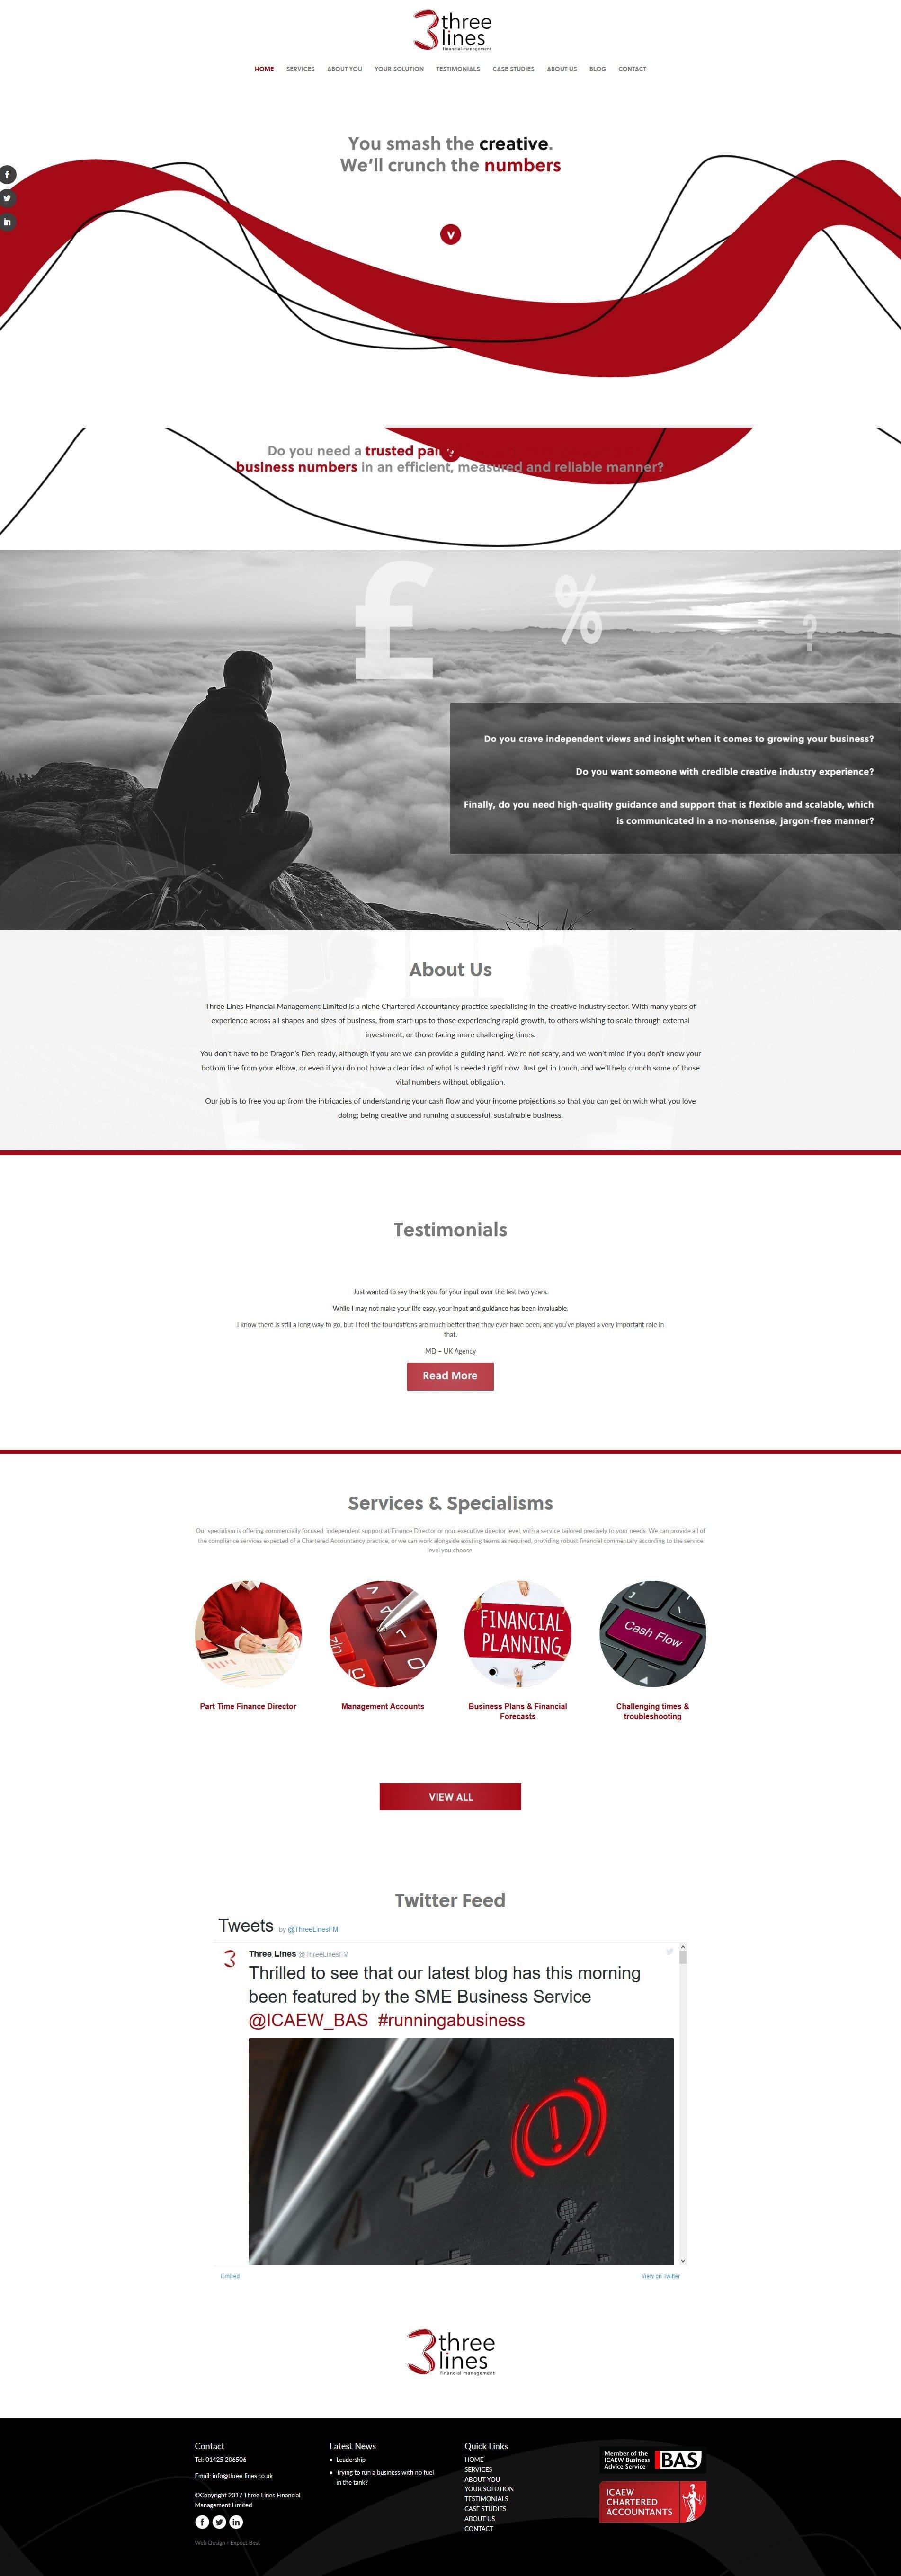 Web Design Three Lines Financial Management Bournemouth